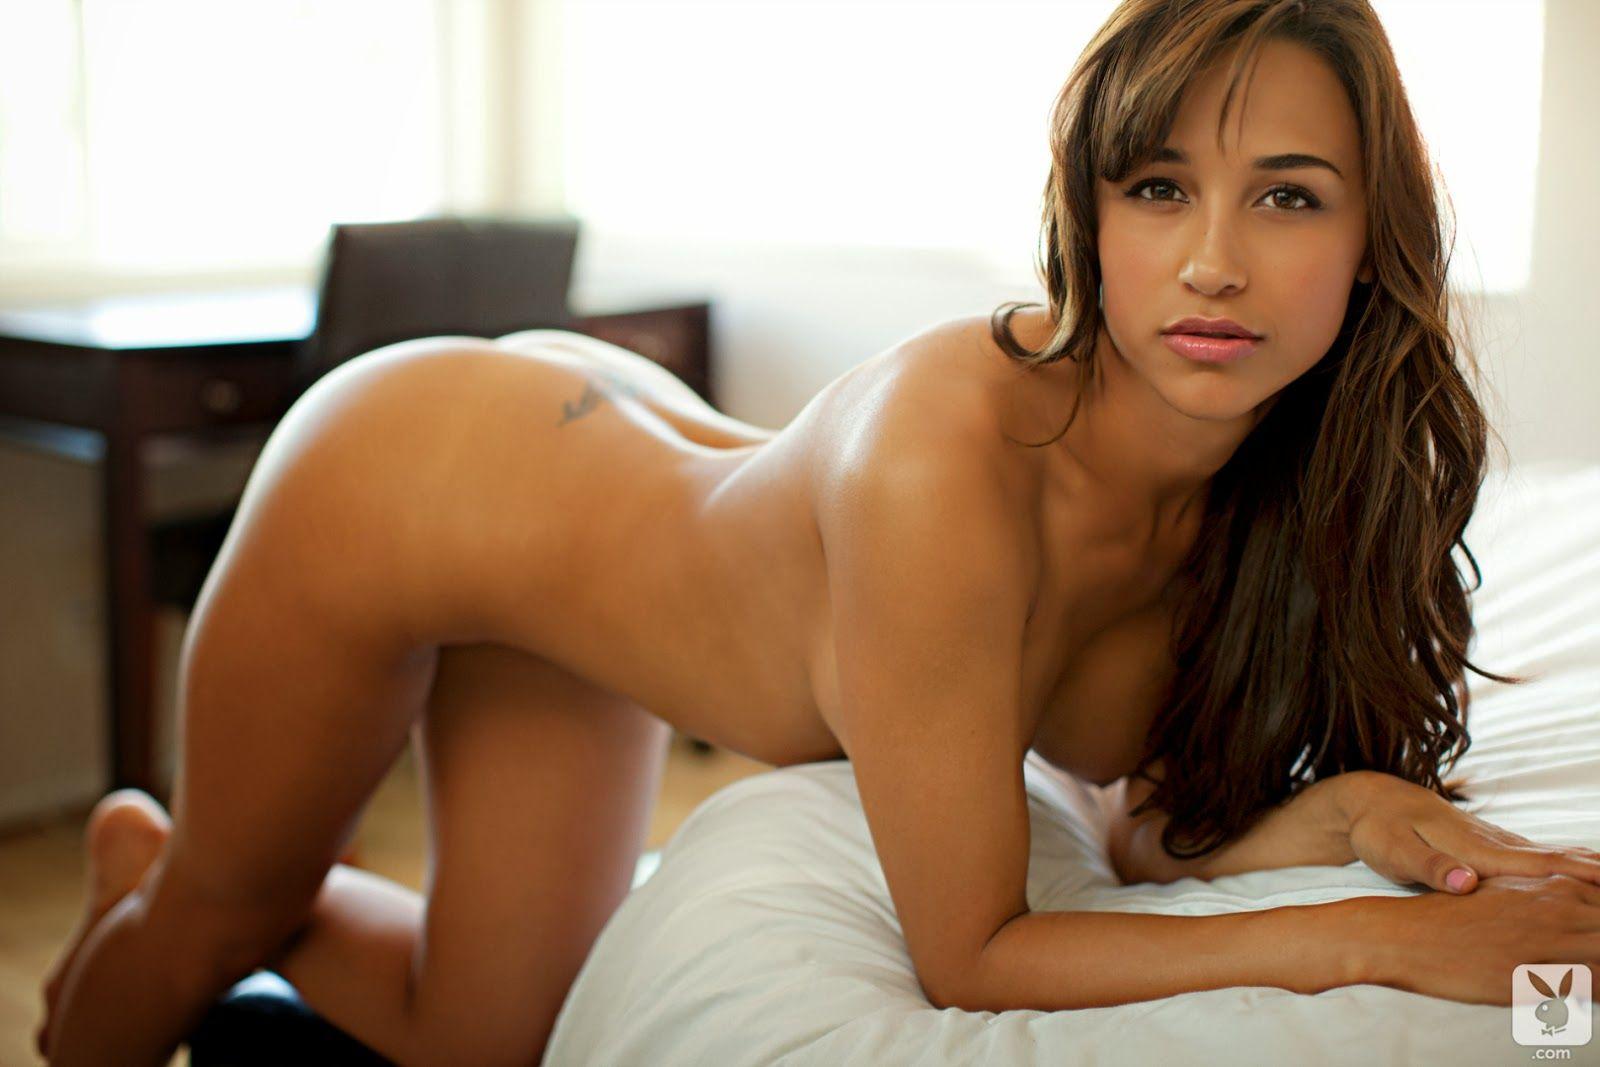 Ana Carolina Playboy ana cheri images - megapornx